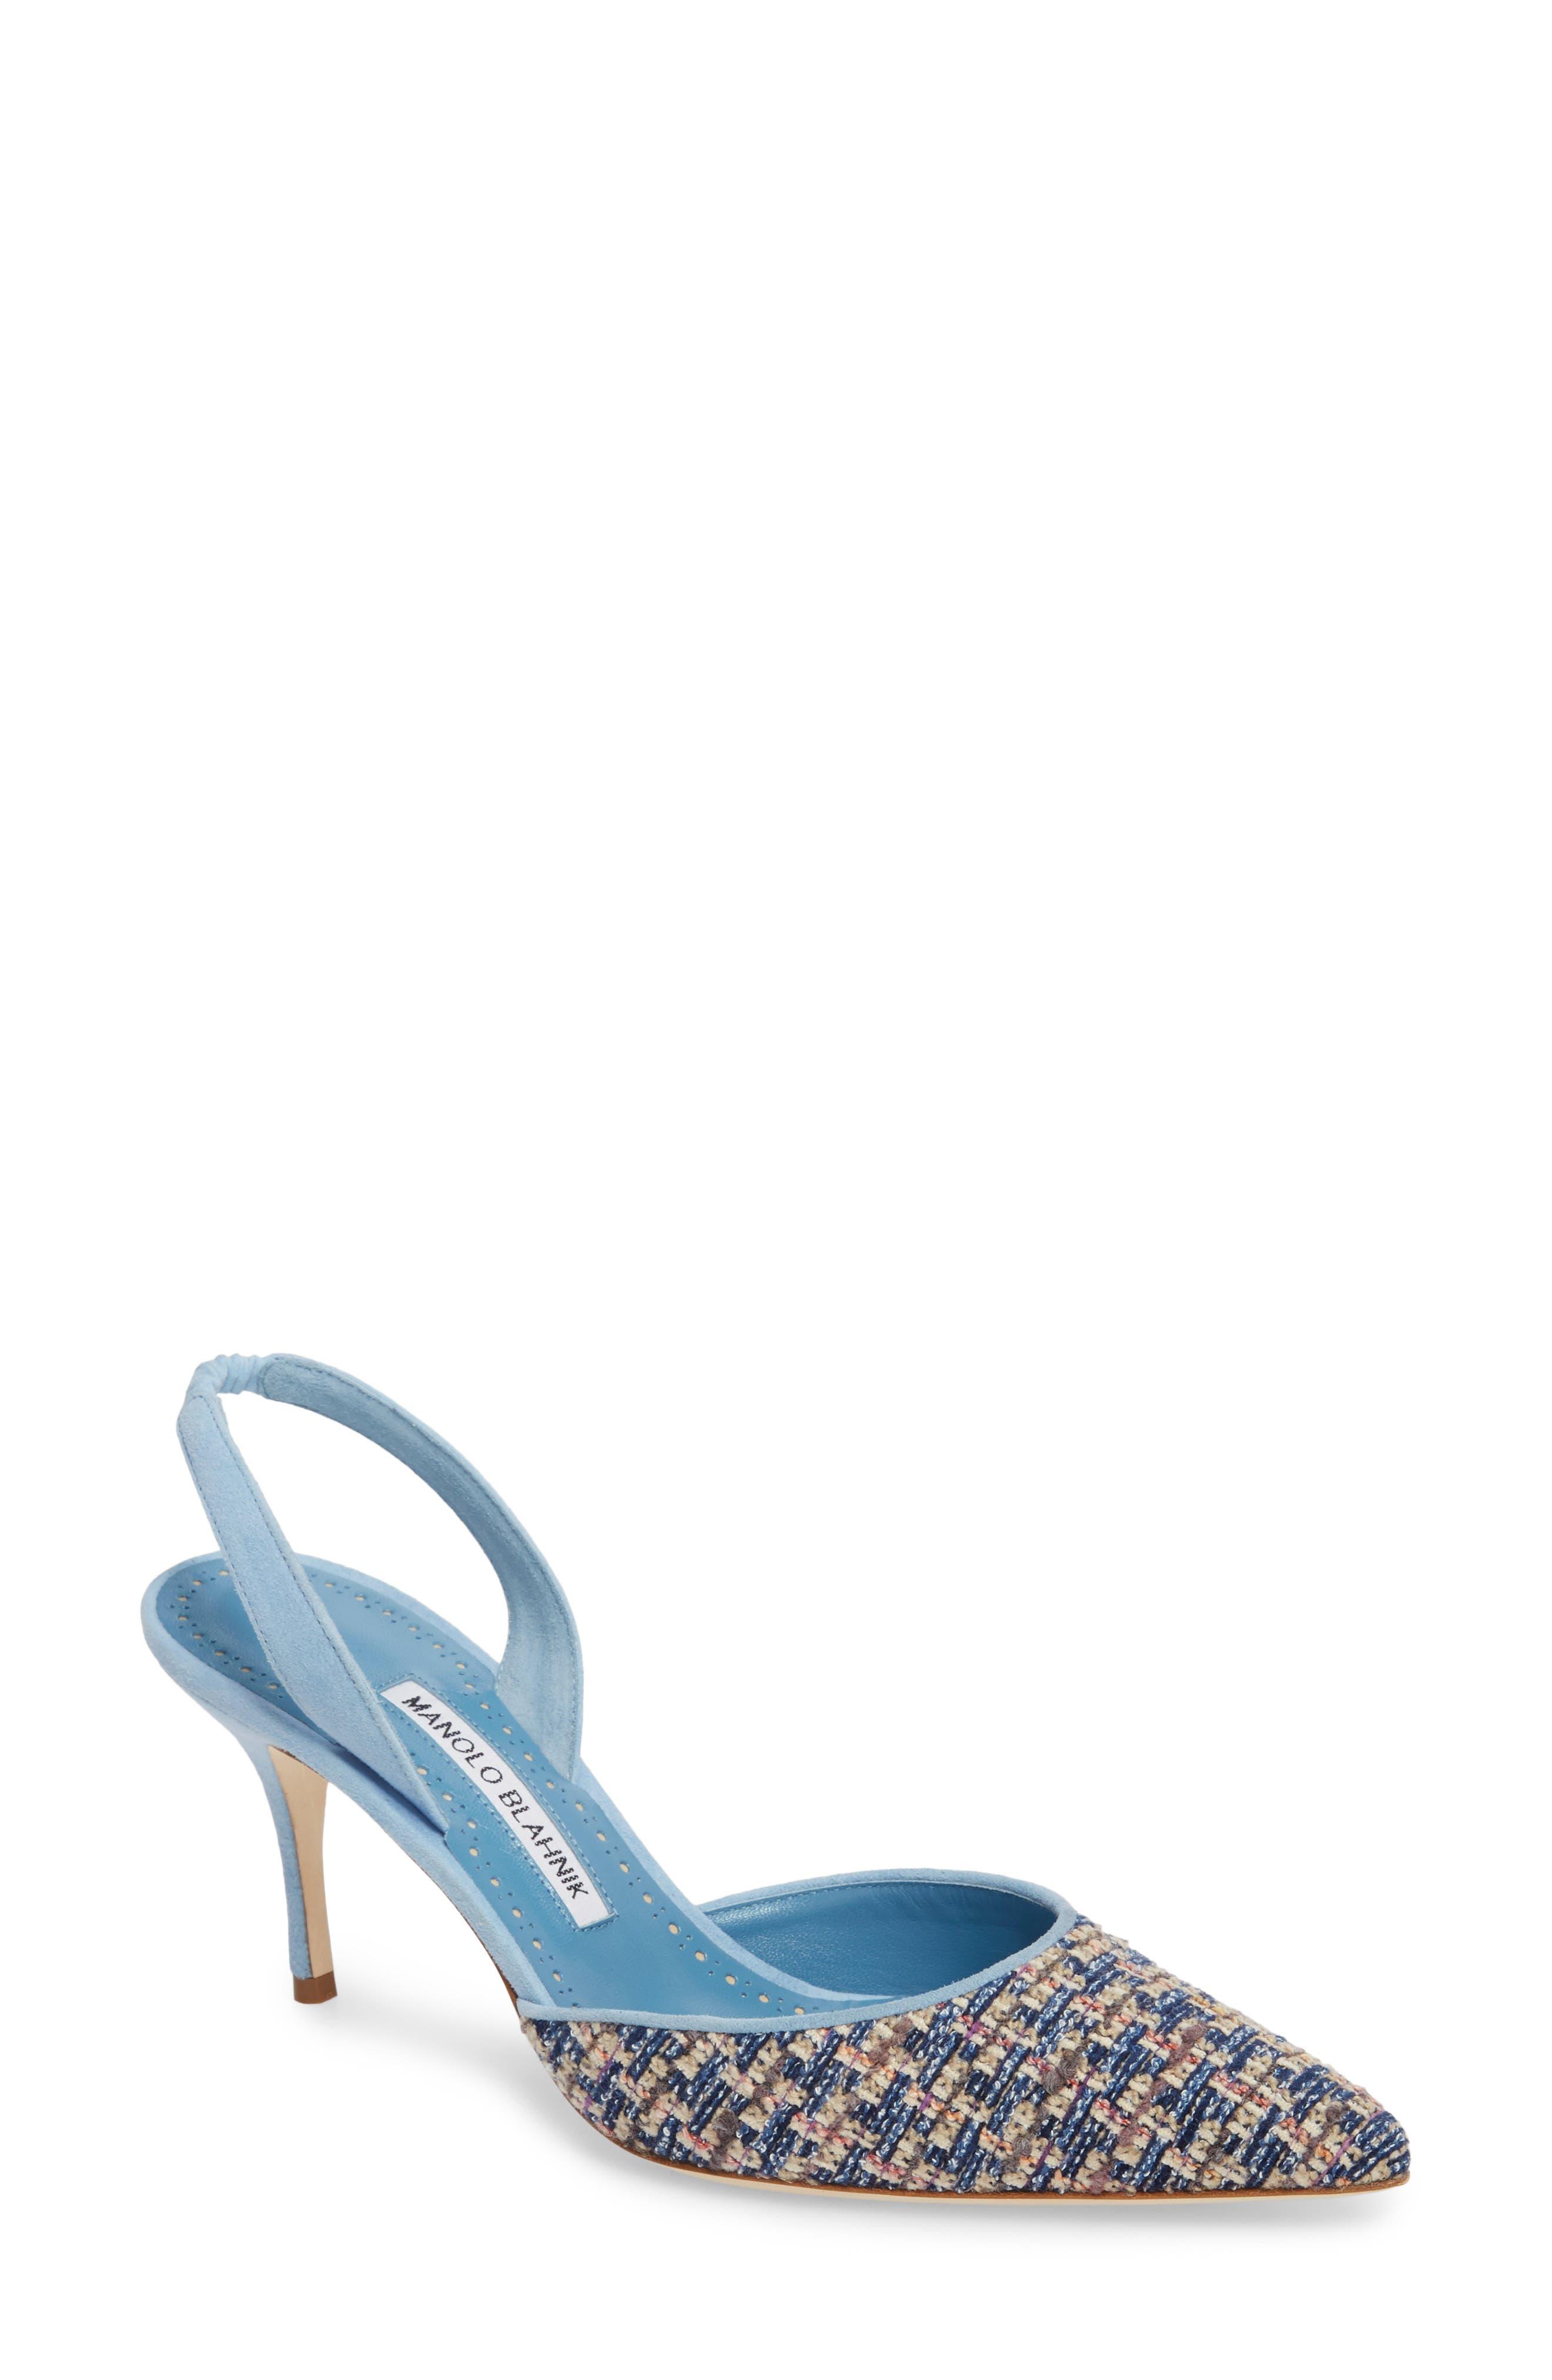 'Carolyne' Pointy Toe Slingback Pump,                             Main thumbnail 1, color,                             Blue Tweed